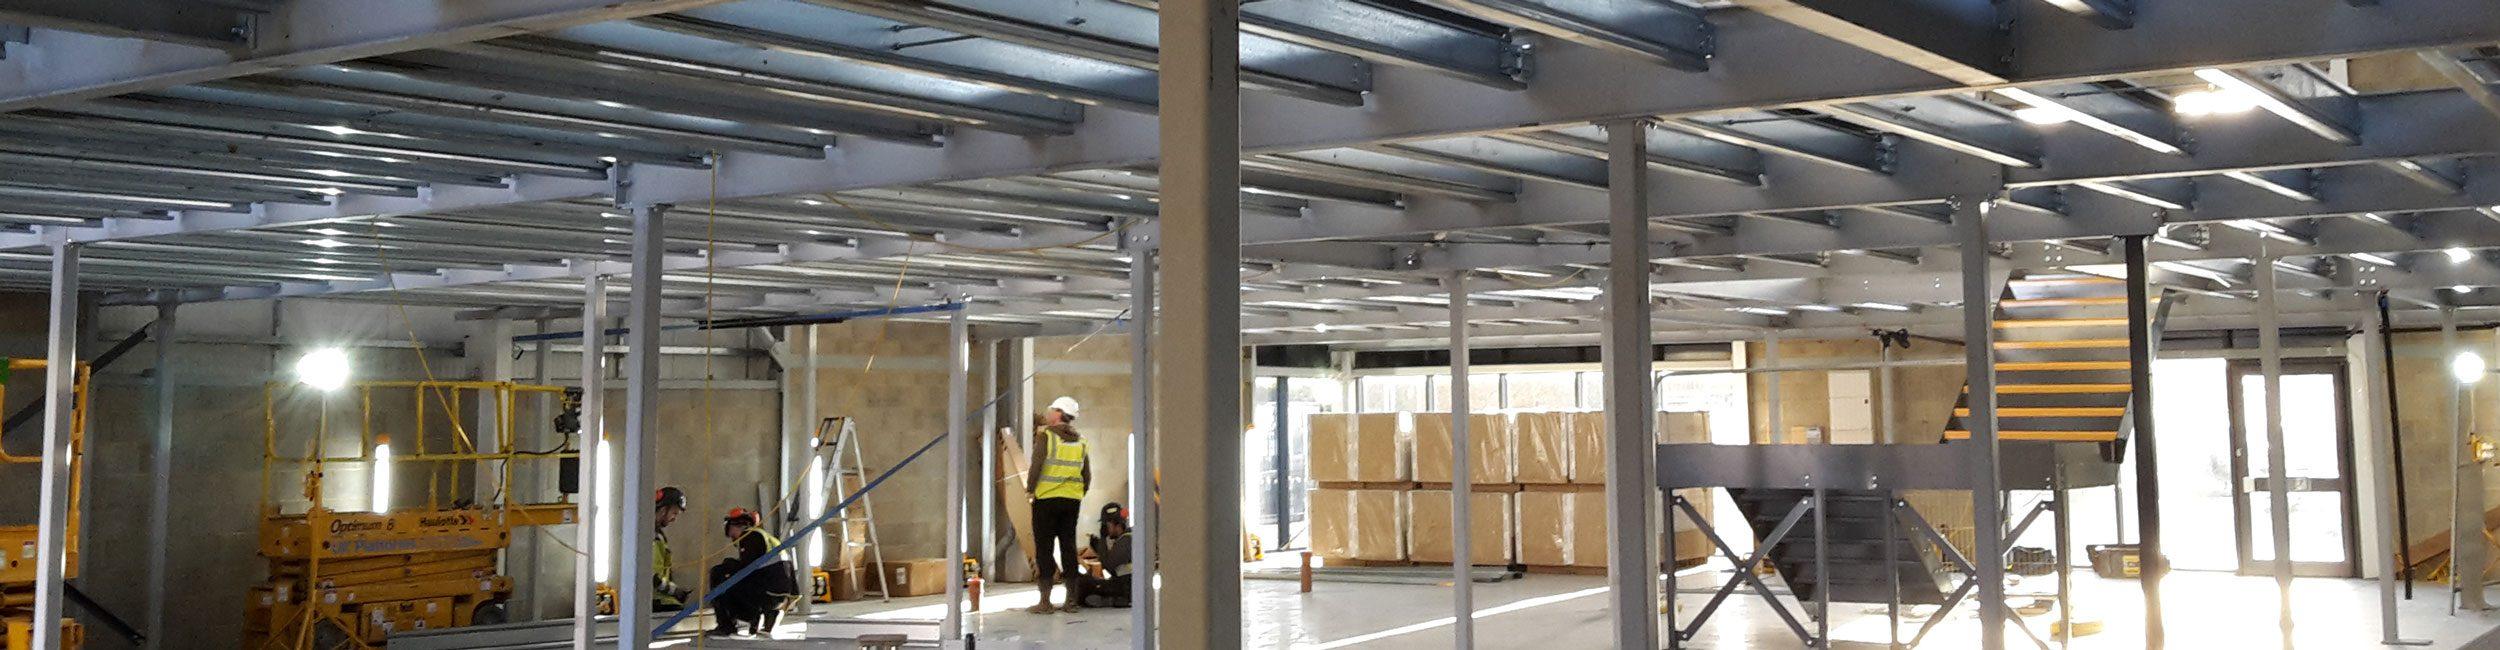 Project Management - Enaflo Interiors